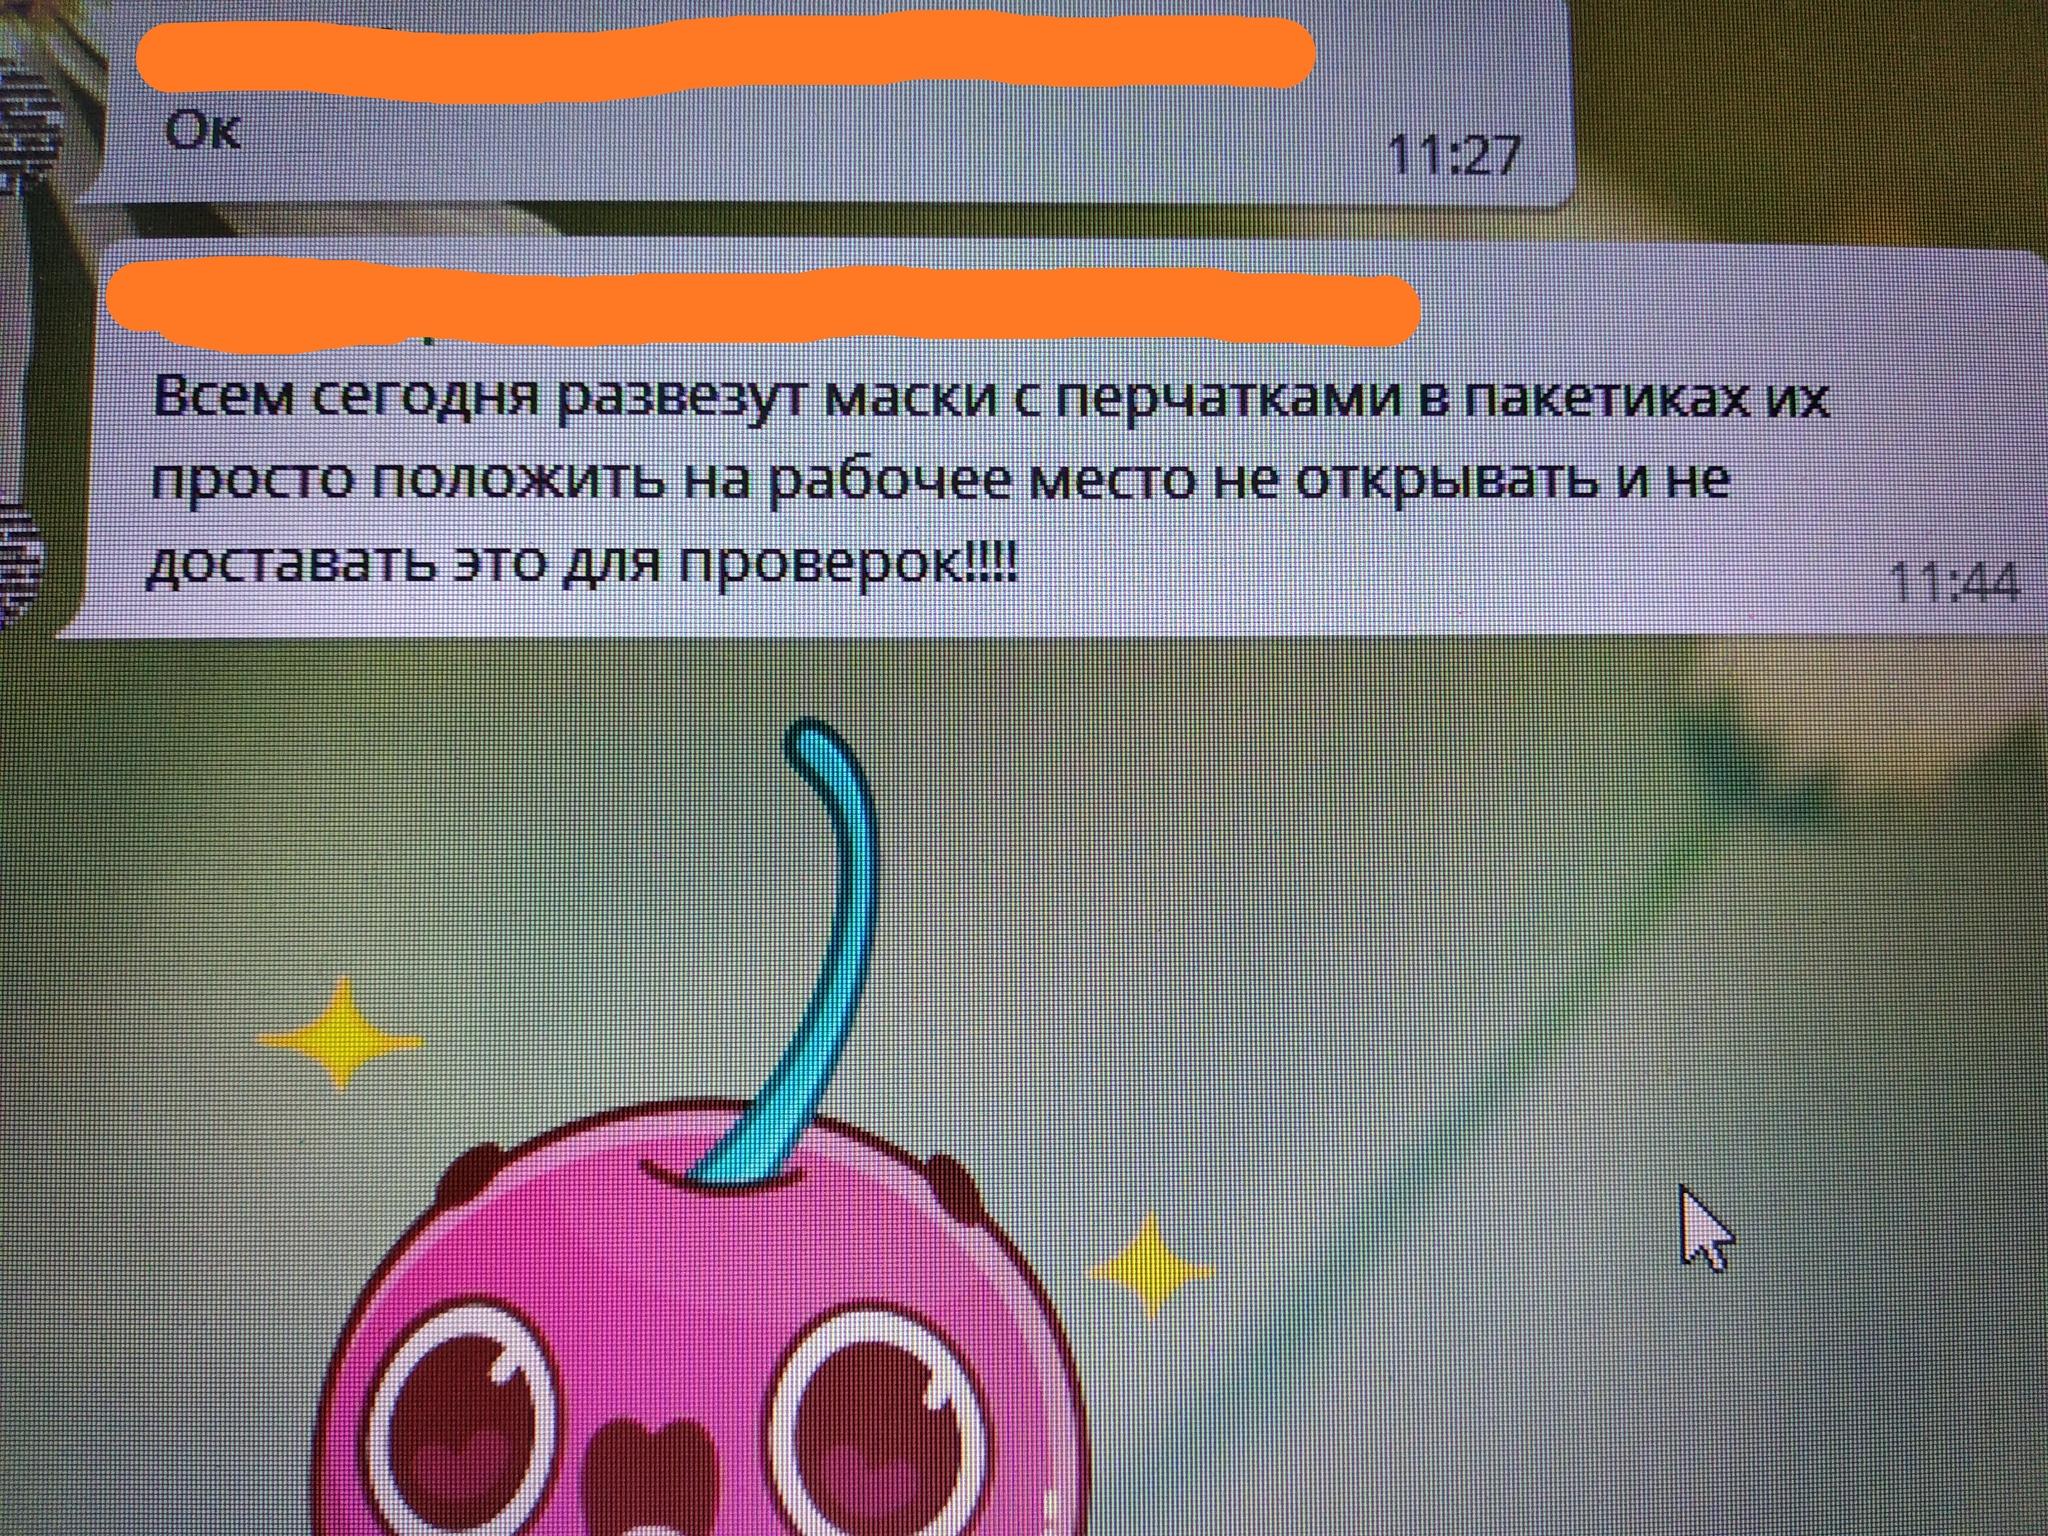 https://cs10.pikabu.ru/post_img/big/2020/03/21/6/1584781337122171094.jpg